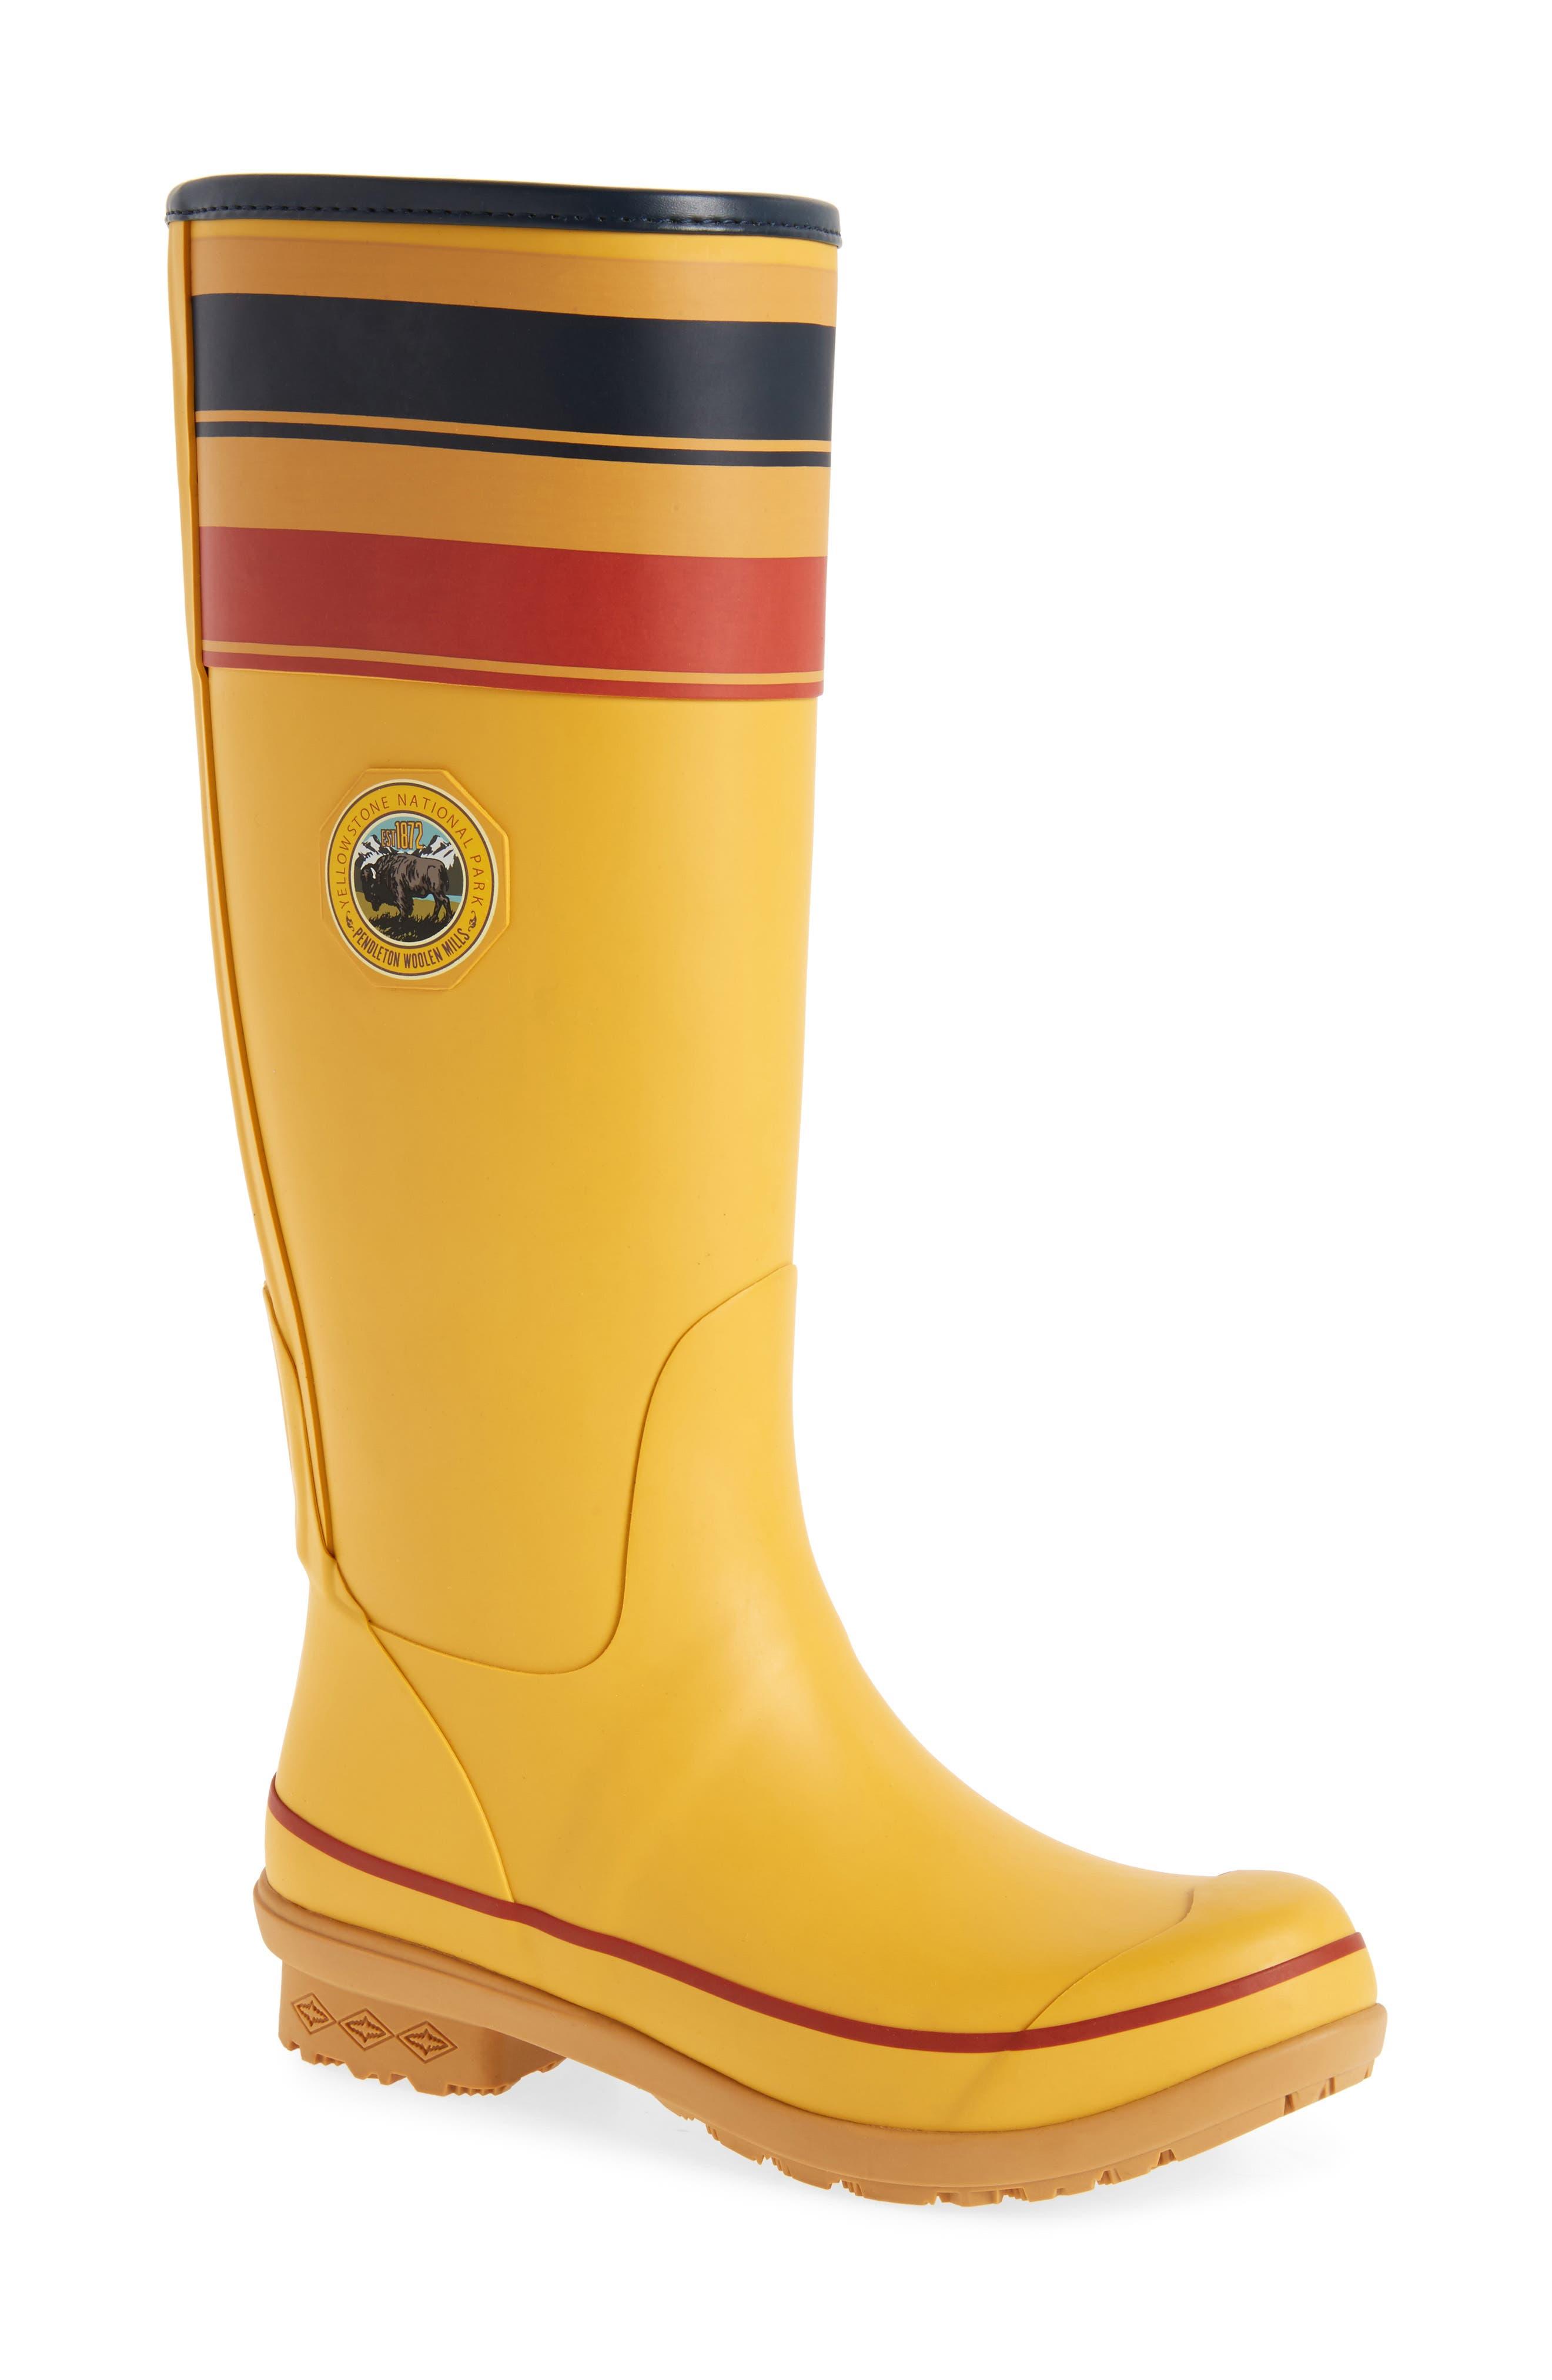 Alternate Image 1 Selected - Pendleton Yellowstone National Park Tall Rain Boot (Women)